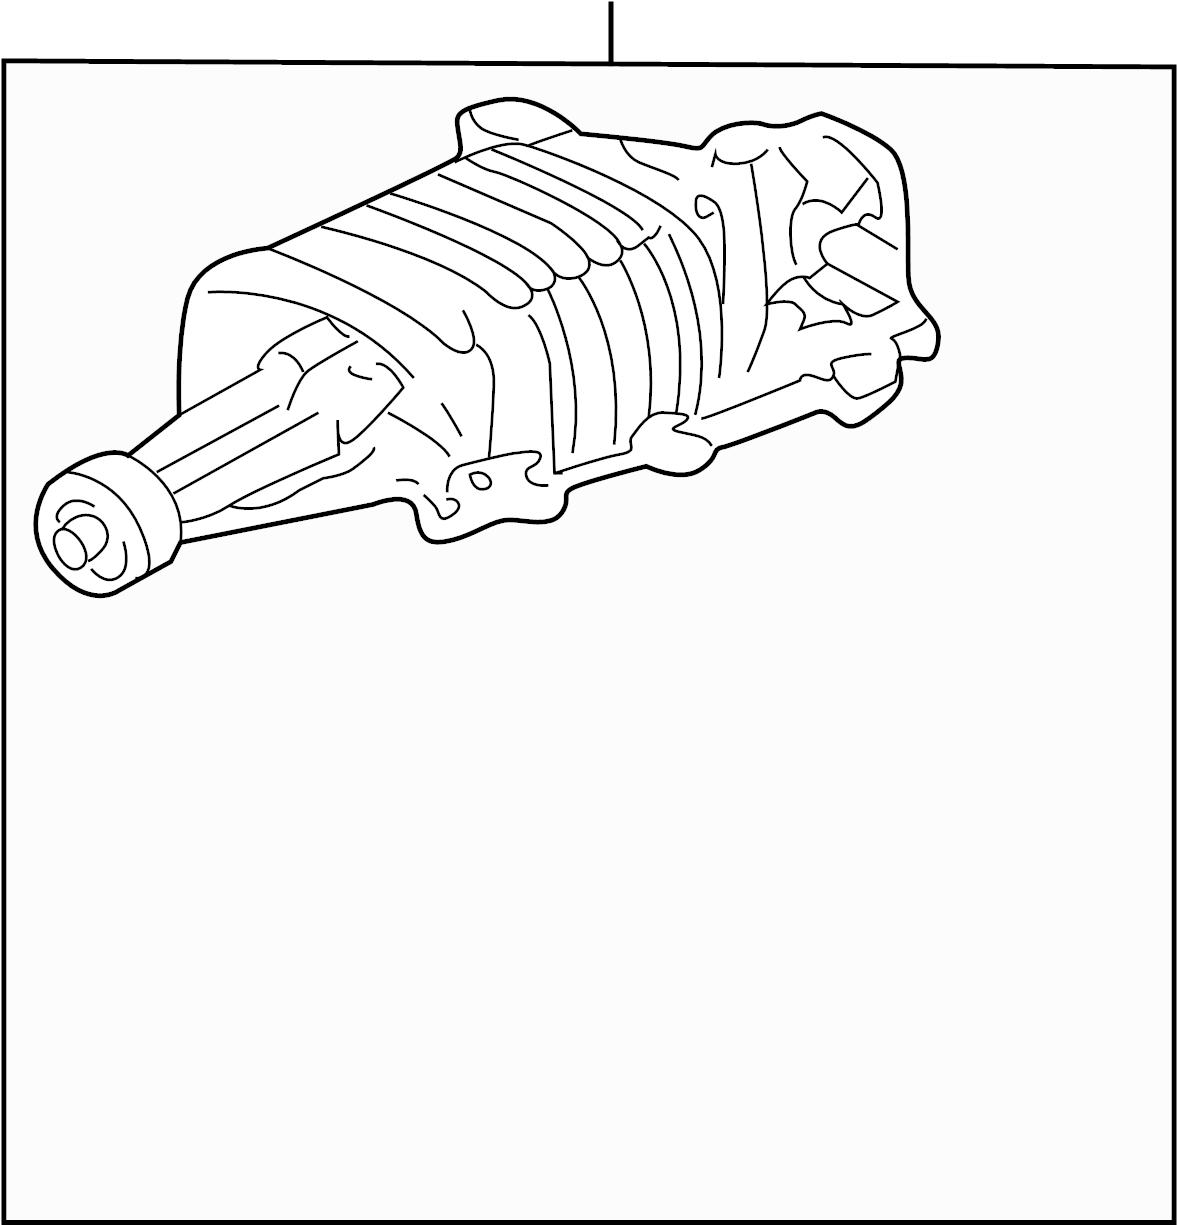 Oldsmobile Supercharger Kits: 1998 Buick Park Avenue ULTRA Superchar. Supercharger